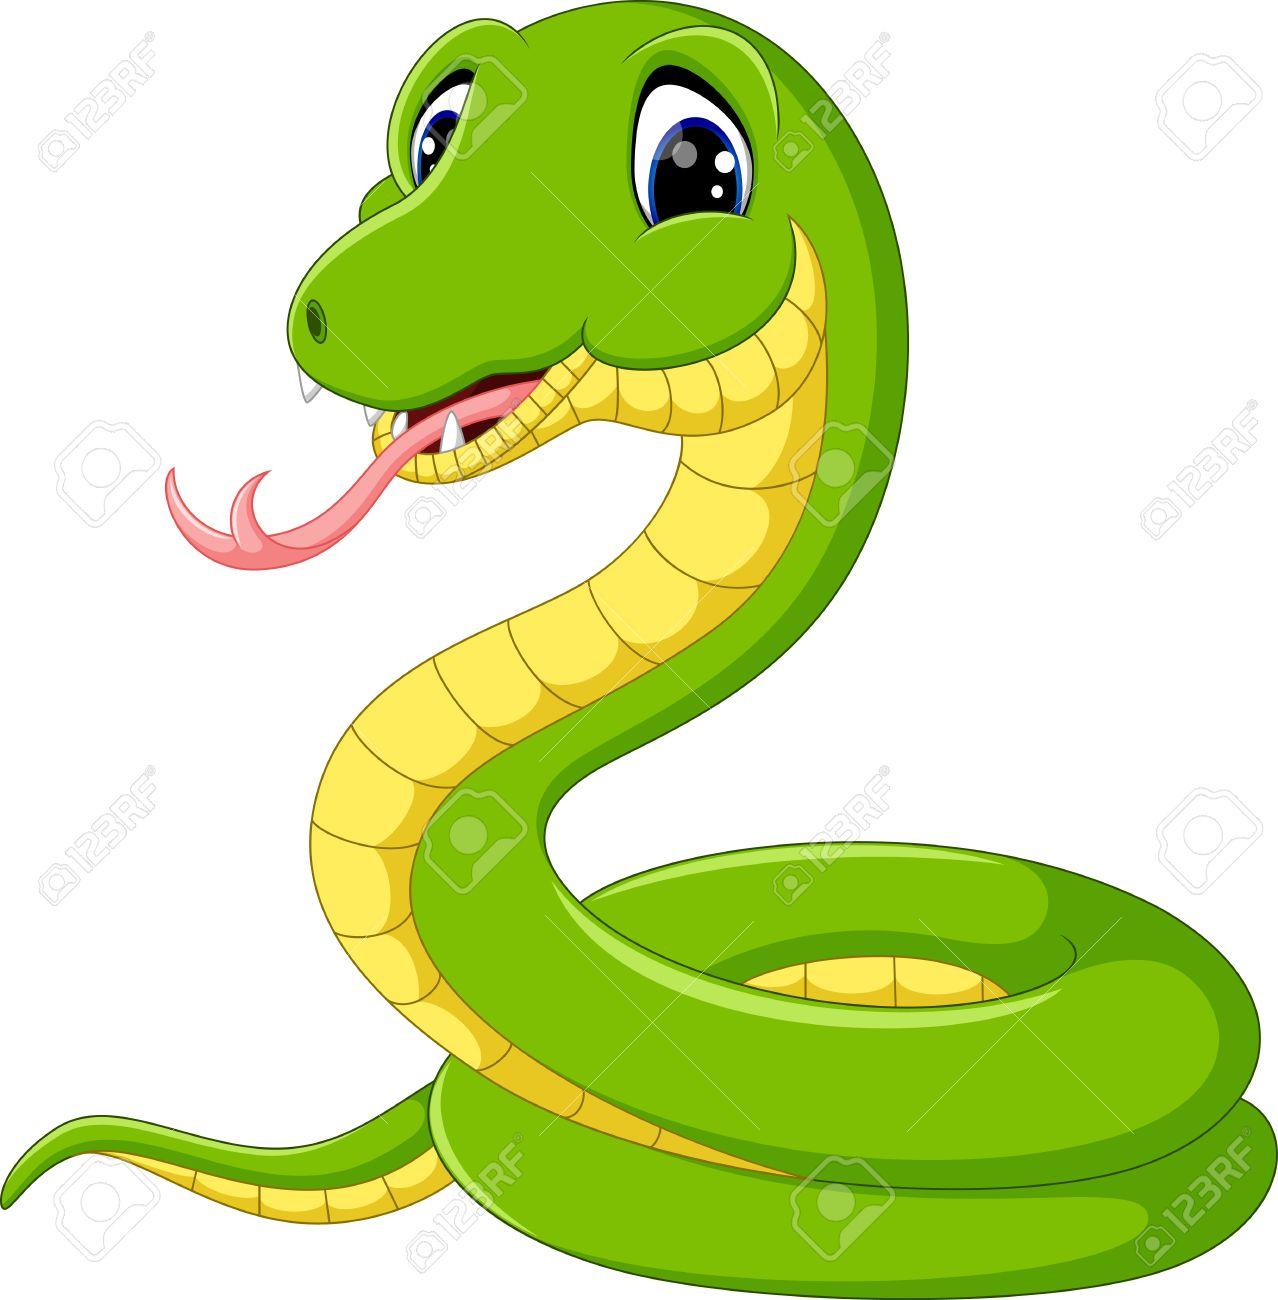 Cute green snake cartoon - 58514373